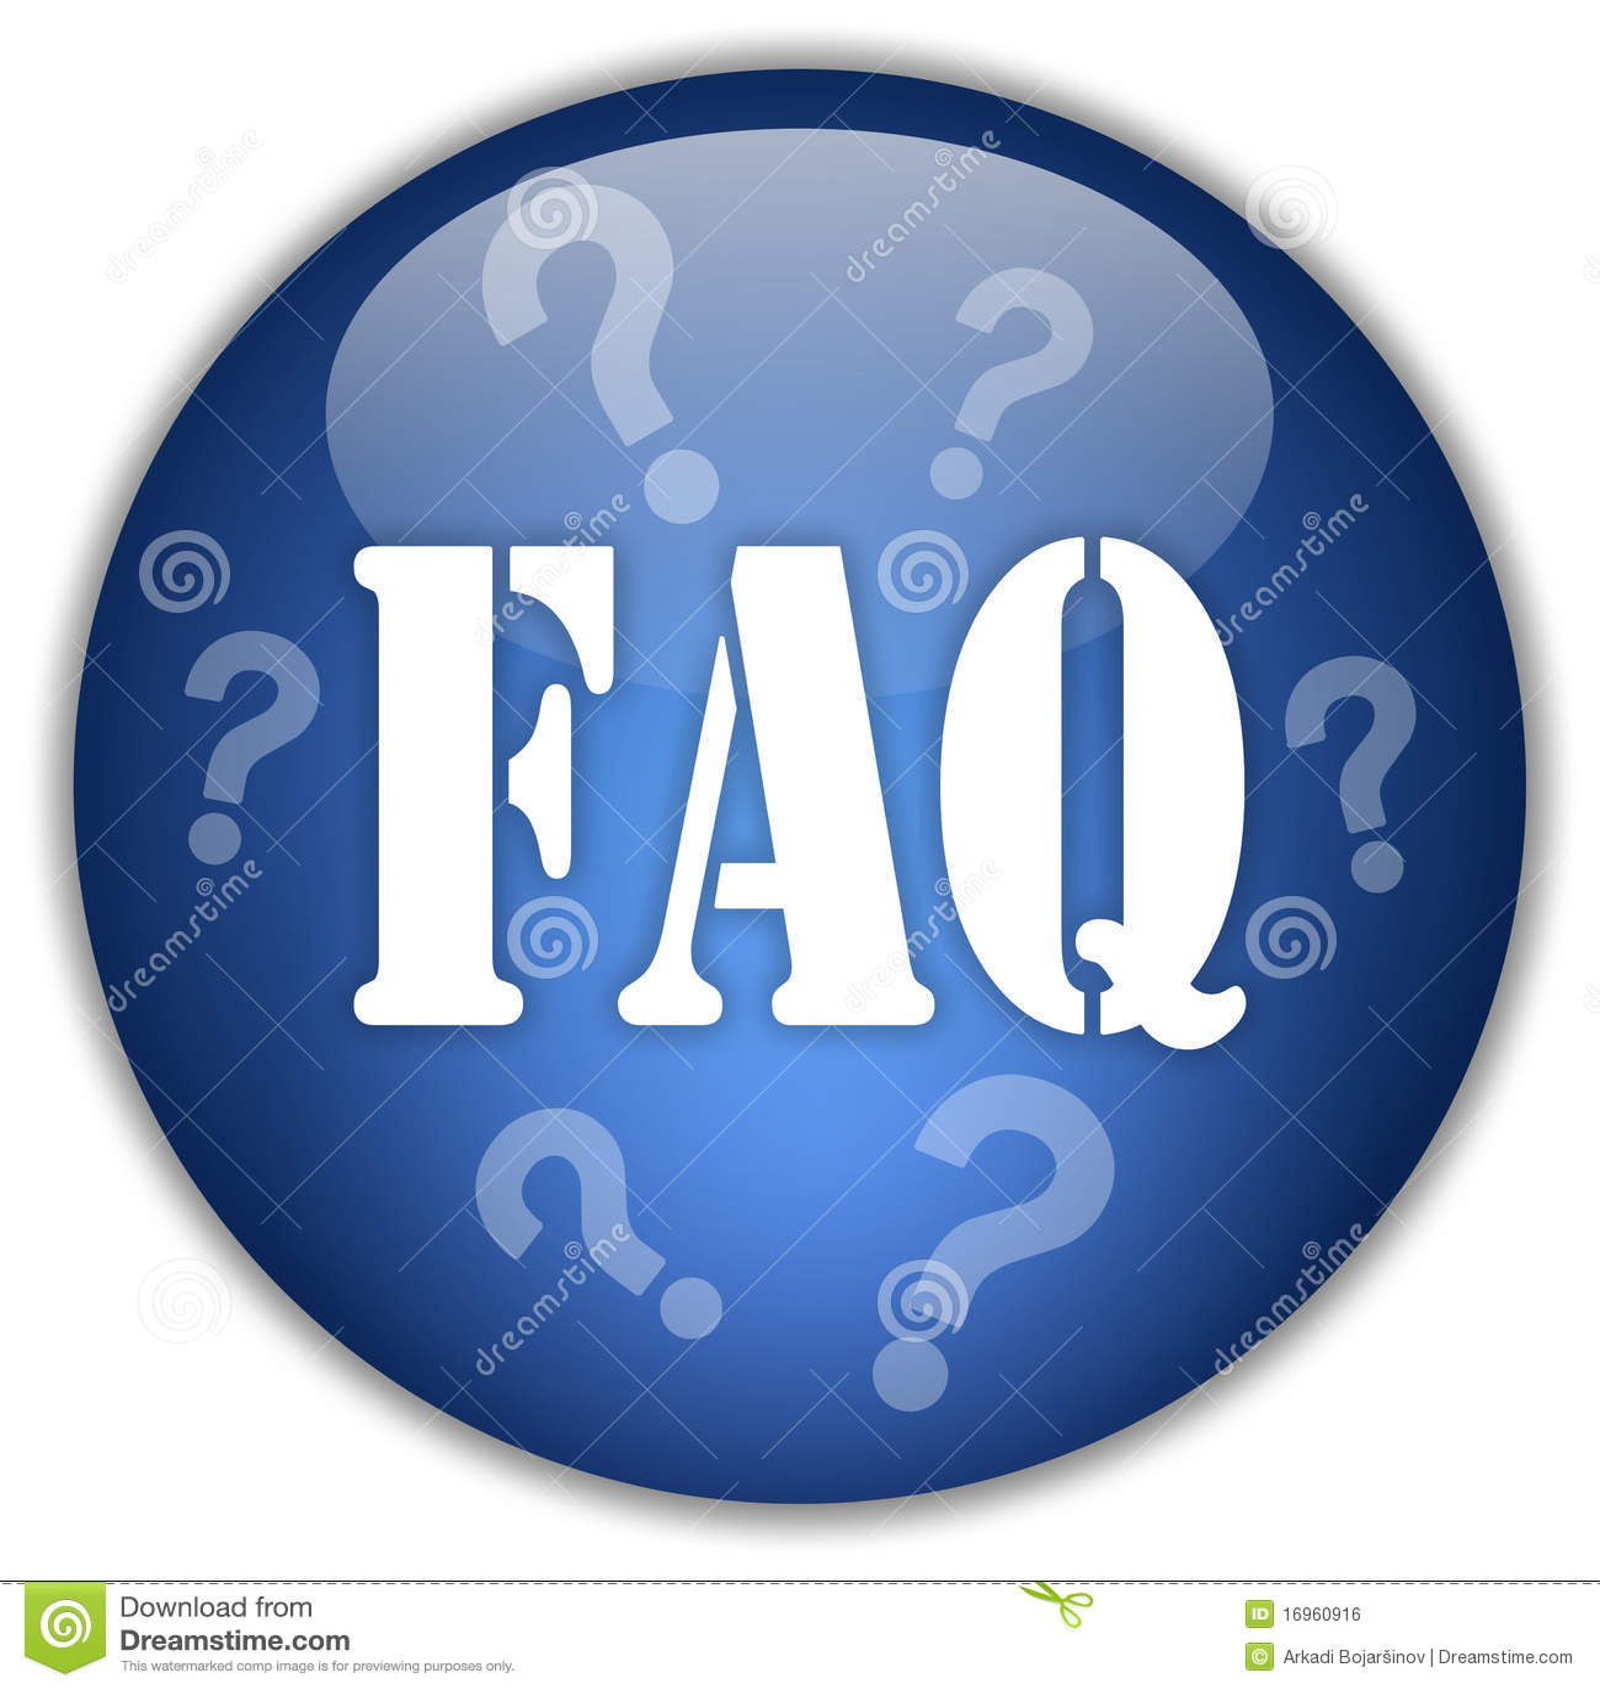 Faq: Faq Button Royalty Free Stock Image